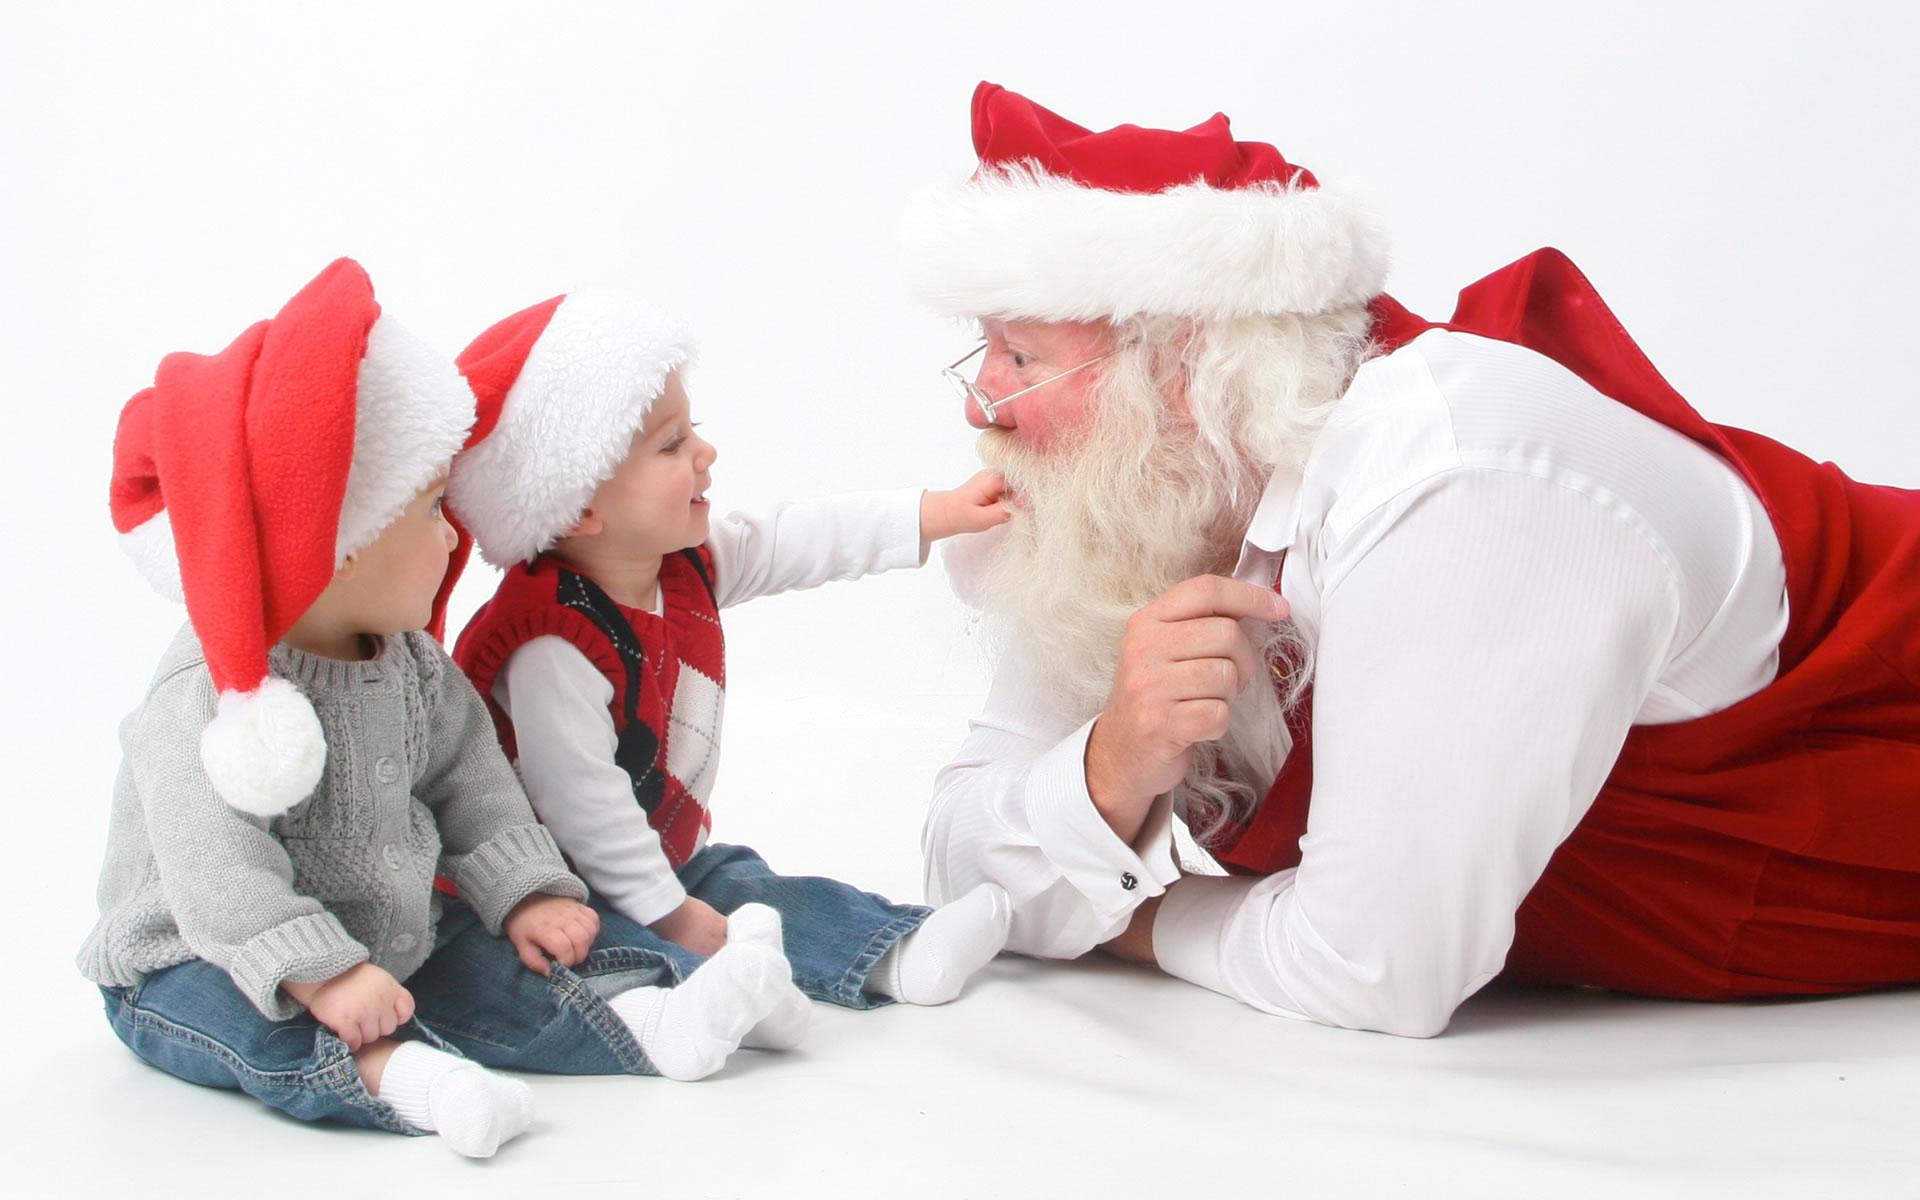 Fondos para móvil de Navidad